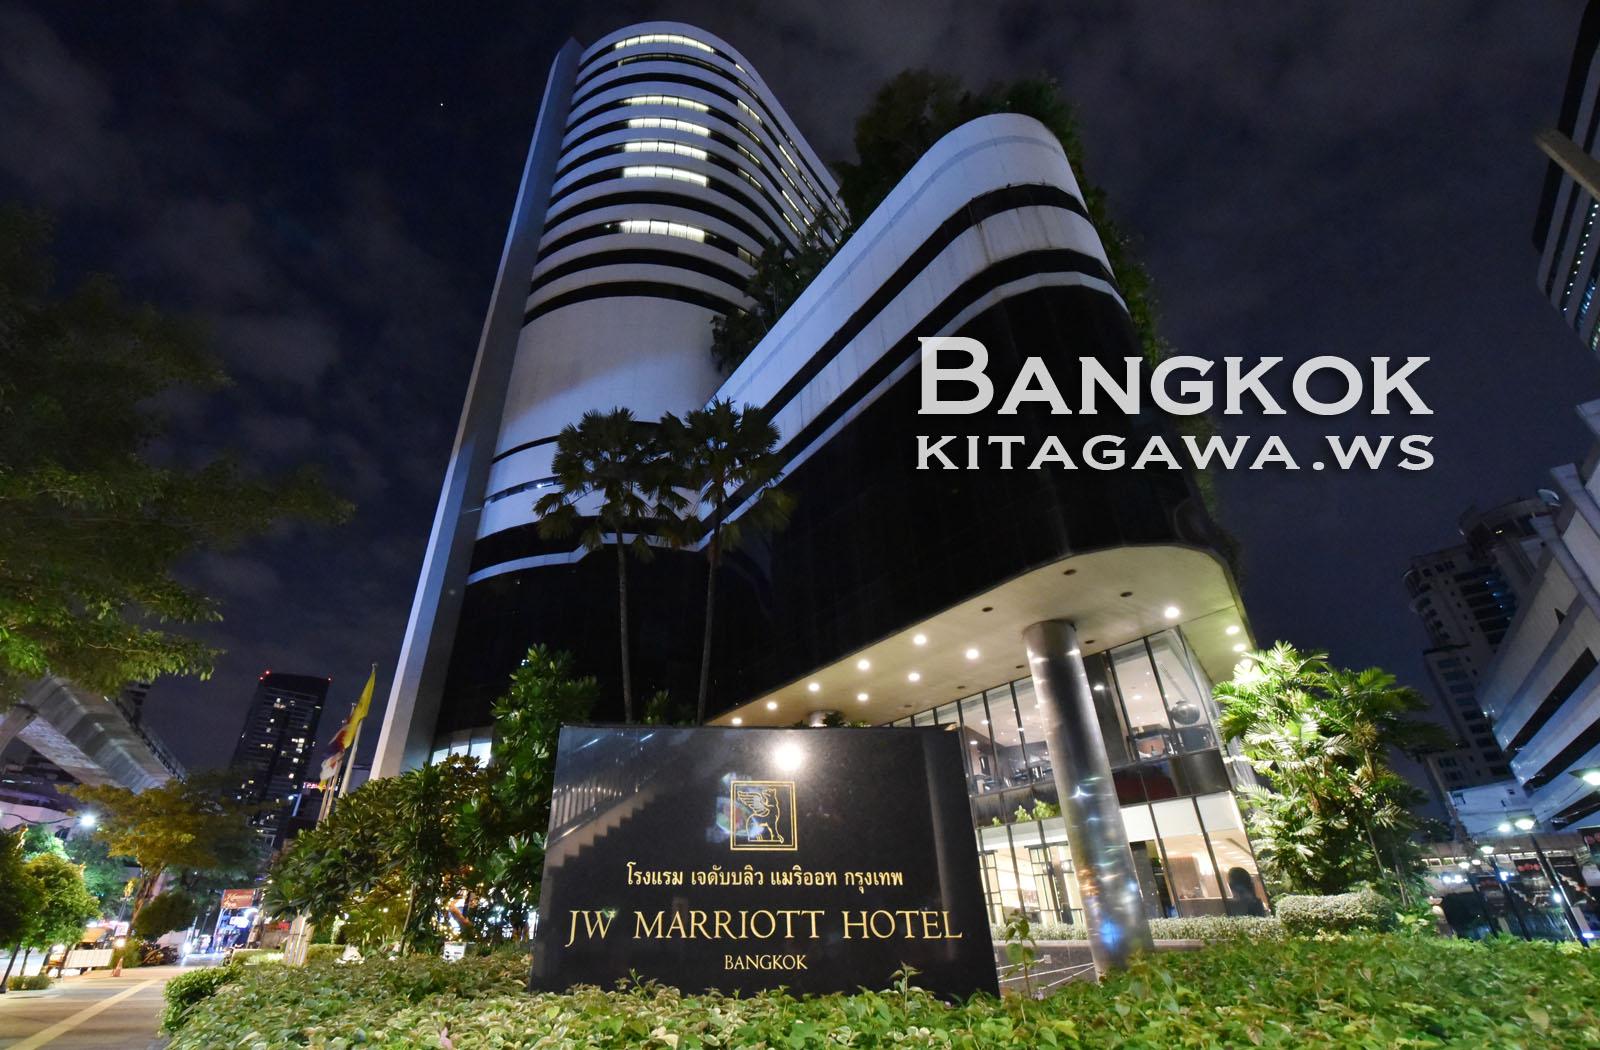 JWマリオットホテルバンコク JW Marriott Hotel Bangkok